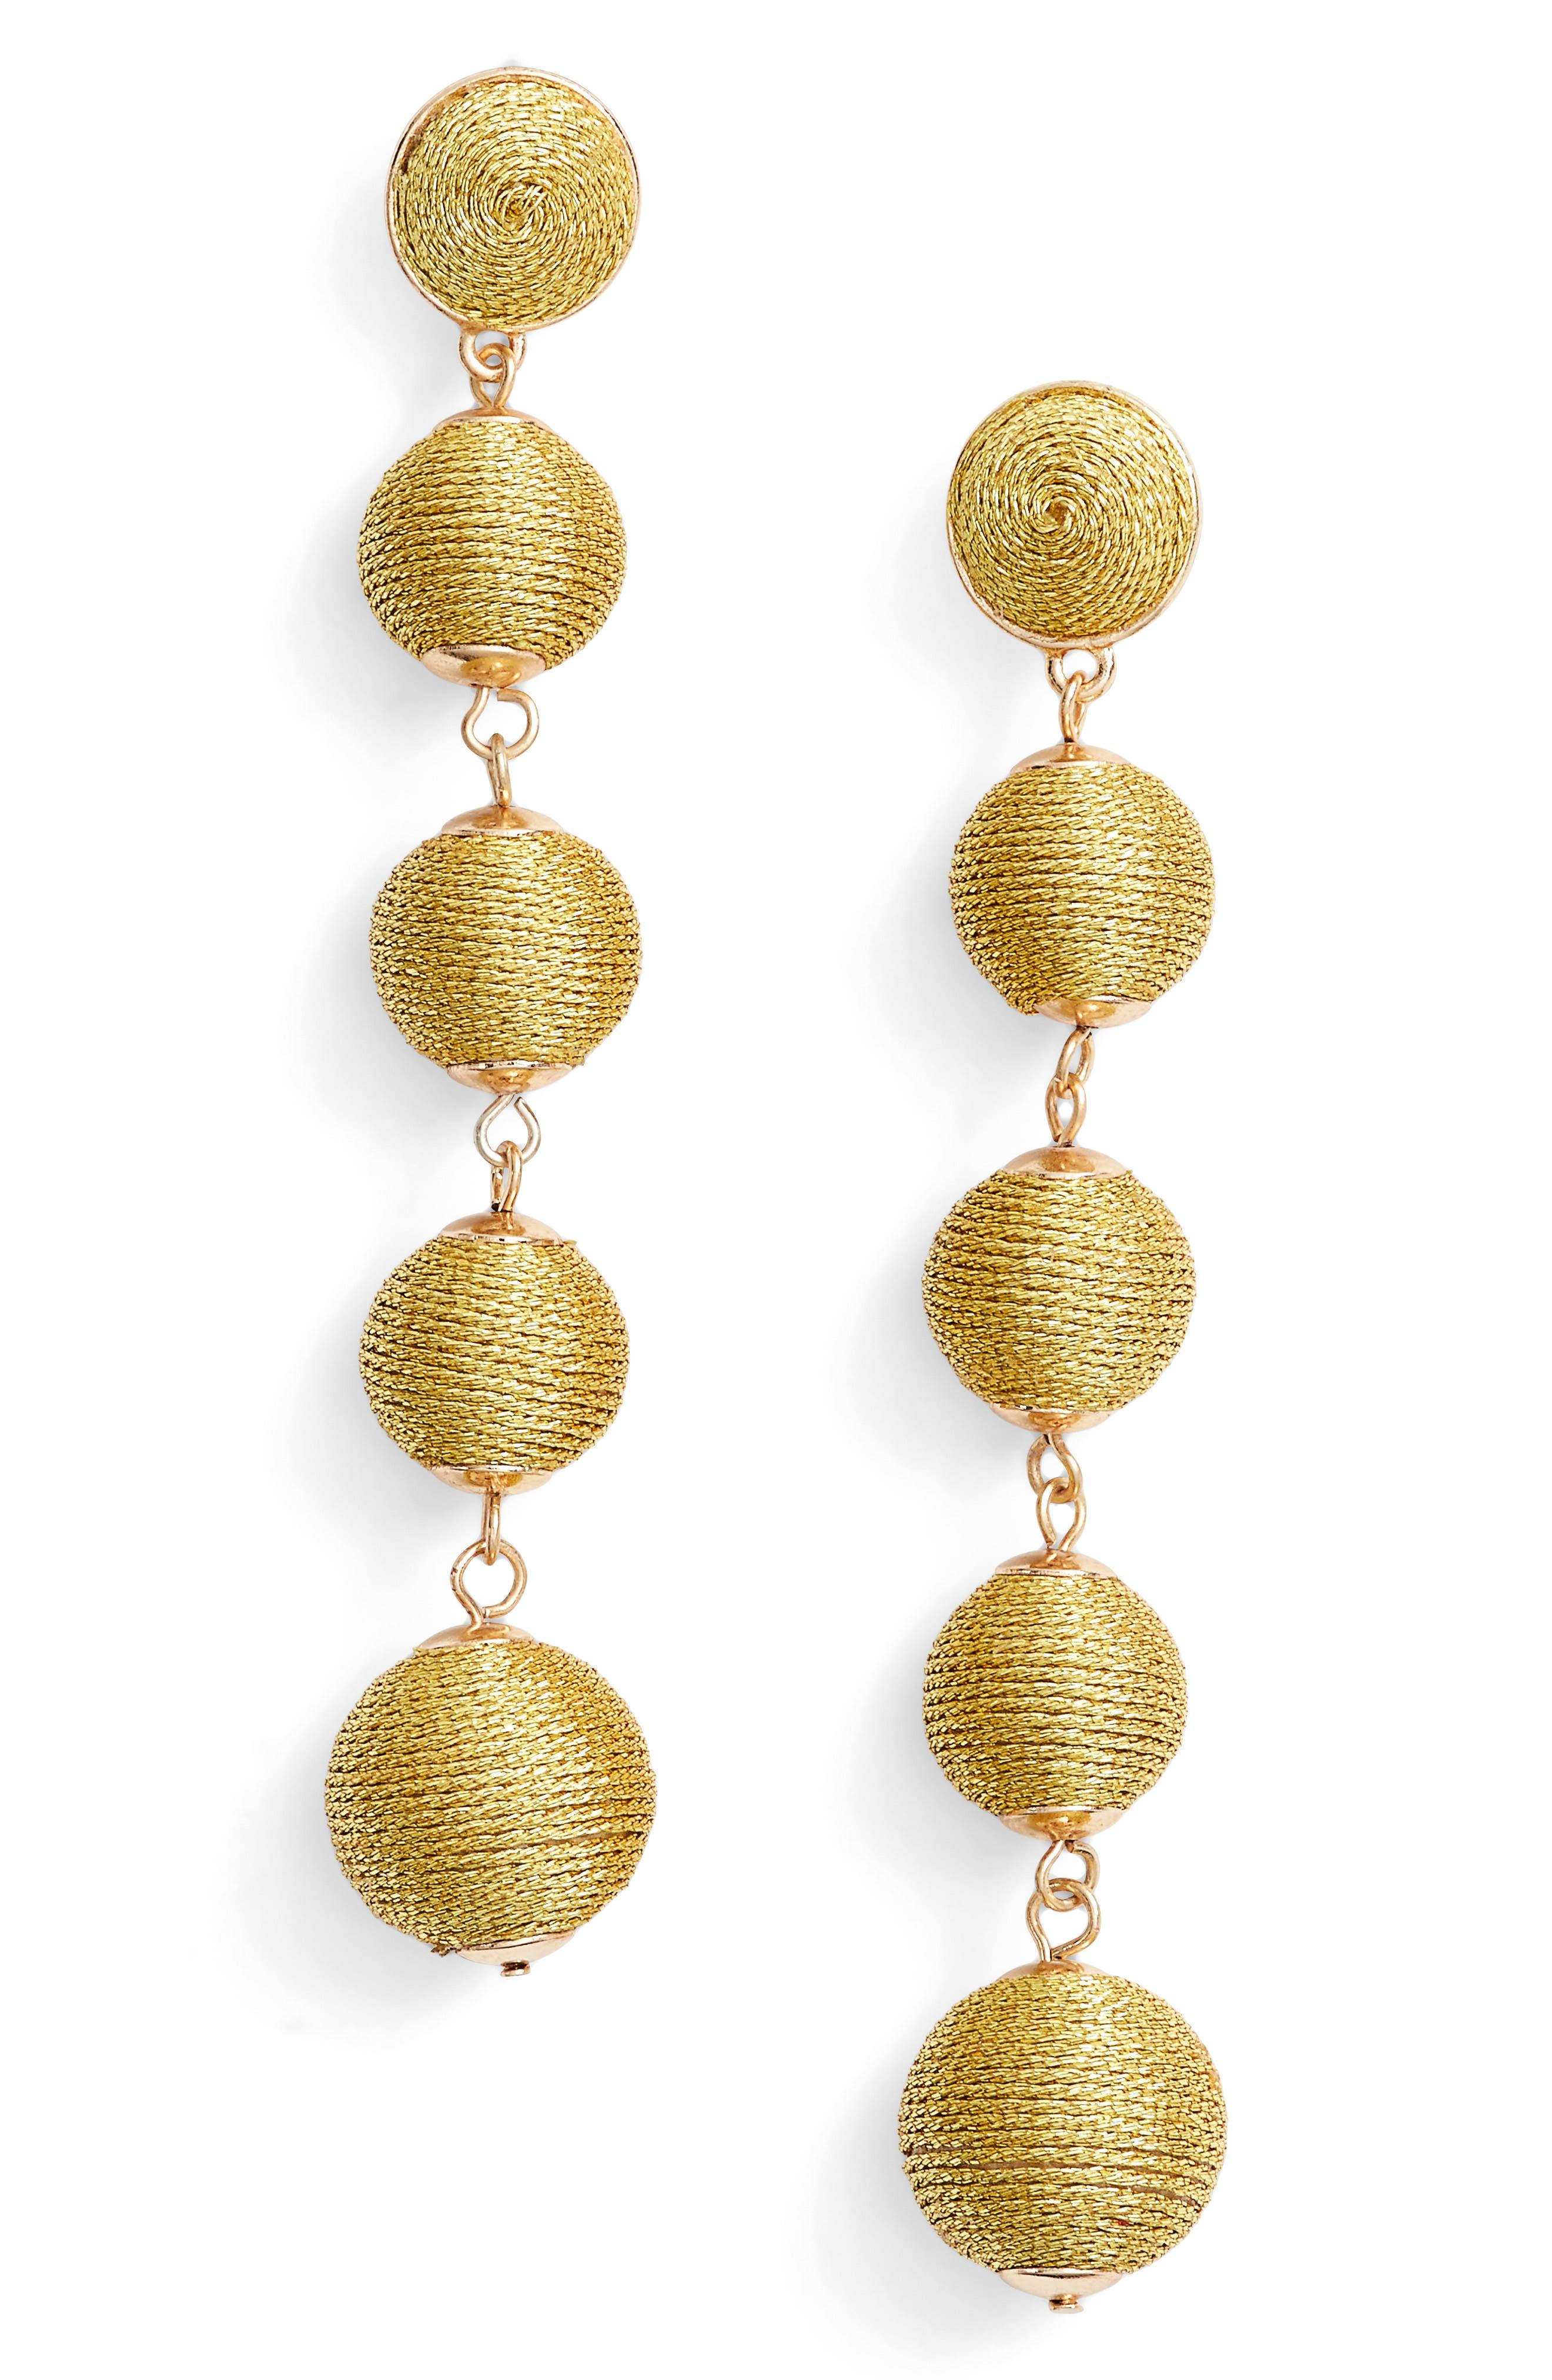 Main Image - Baublebar Metallic Crispin Ball Statement Earrings